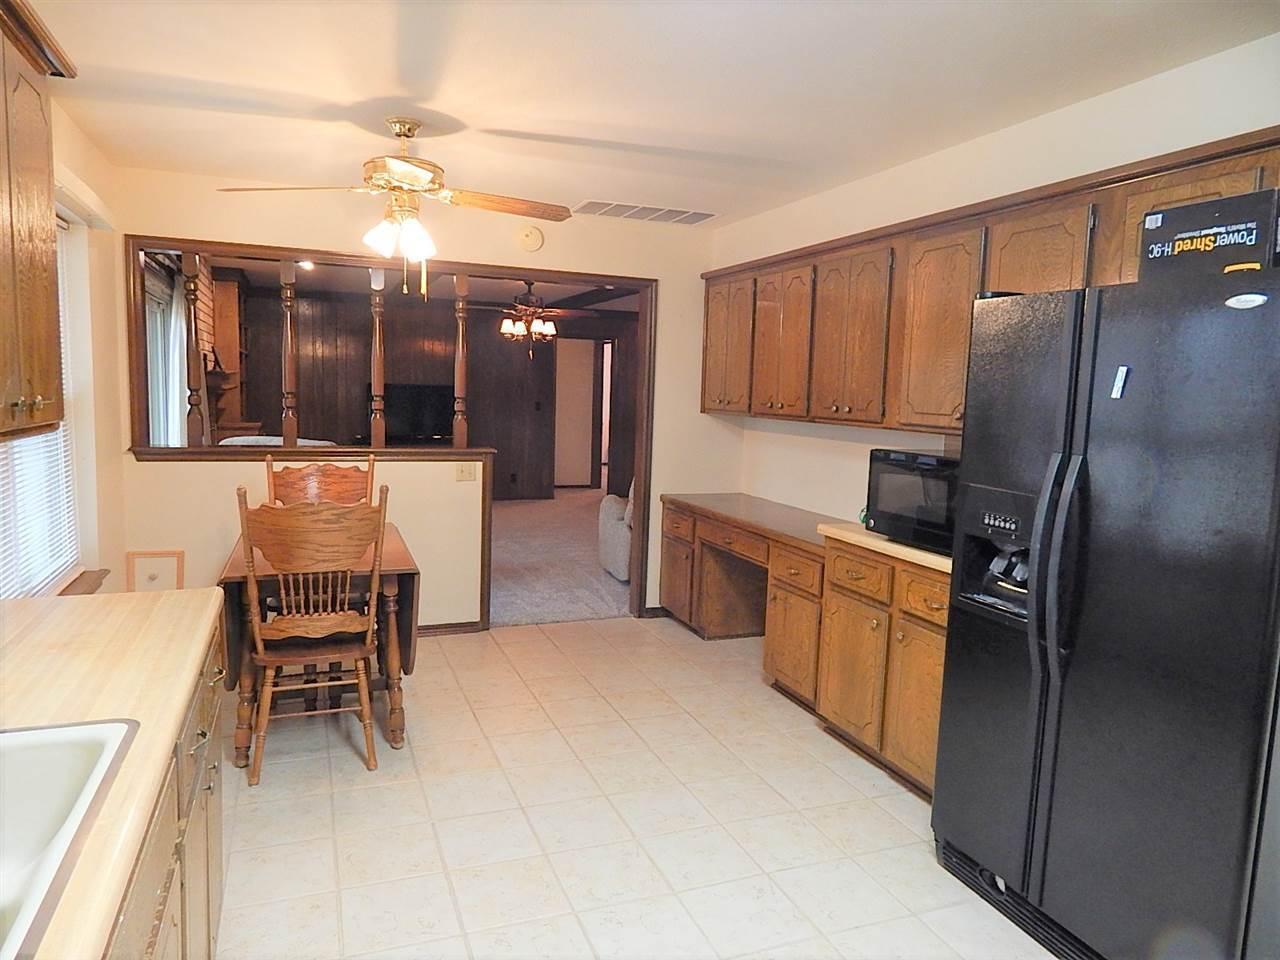 Sold Cross Sale W/ MLS | 2113 Berkshire Ponca City, OK 74604 3